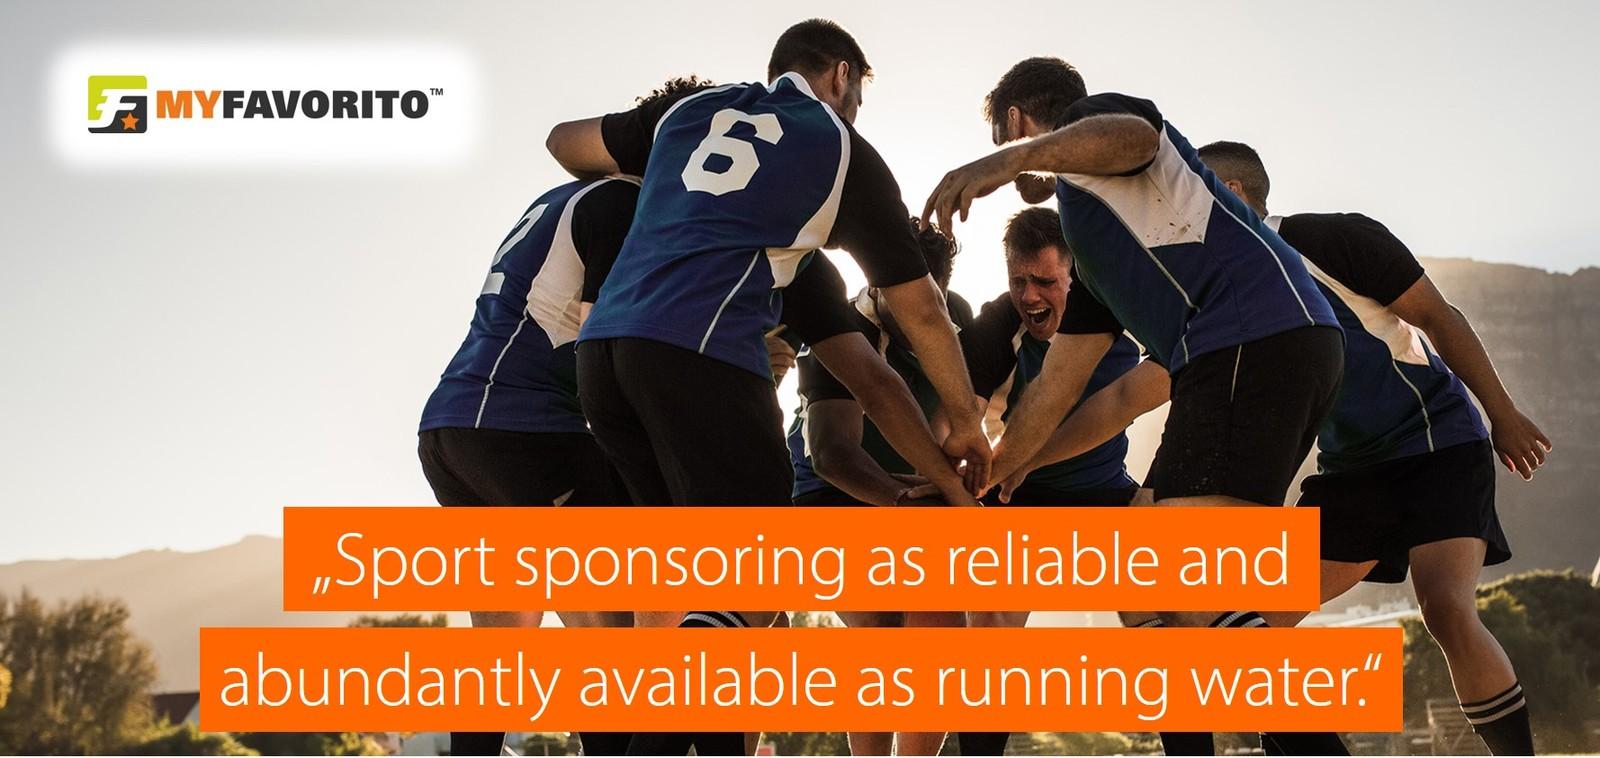 myfavorito sport sponsoring vision en